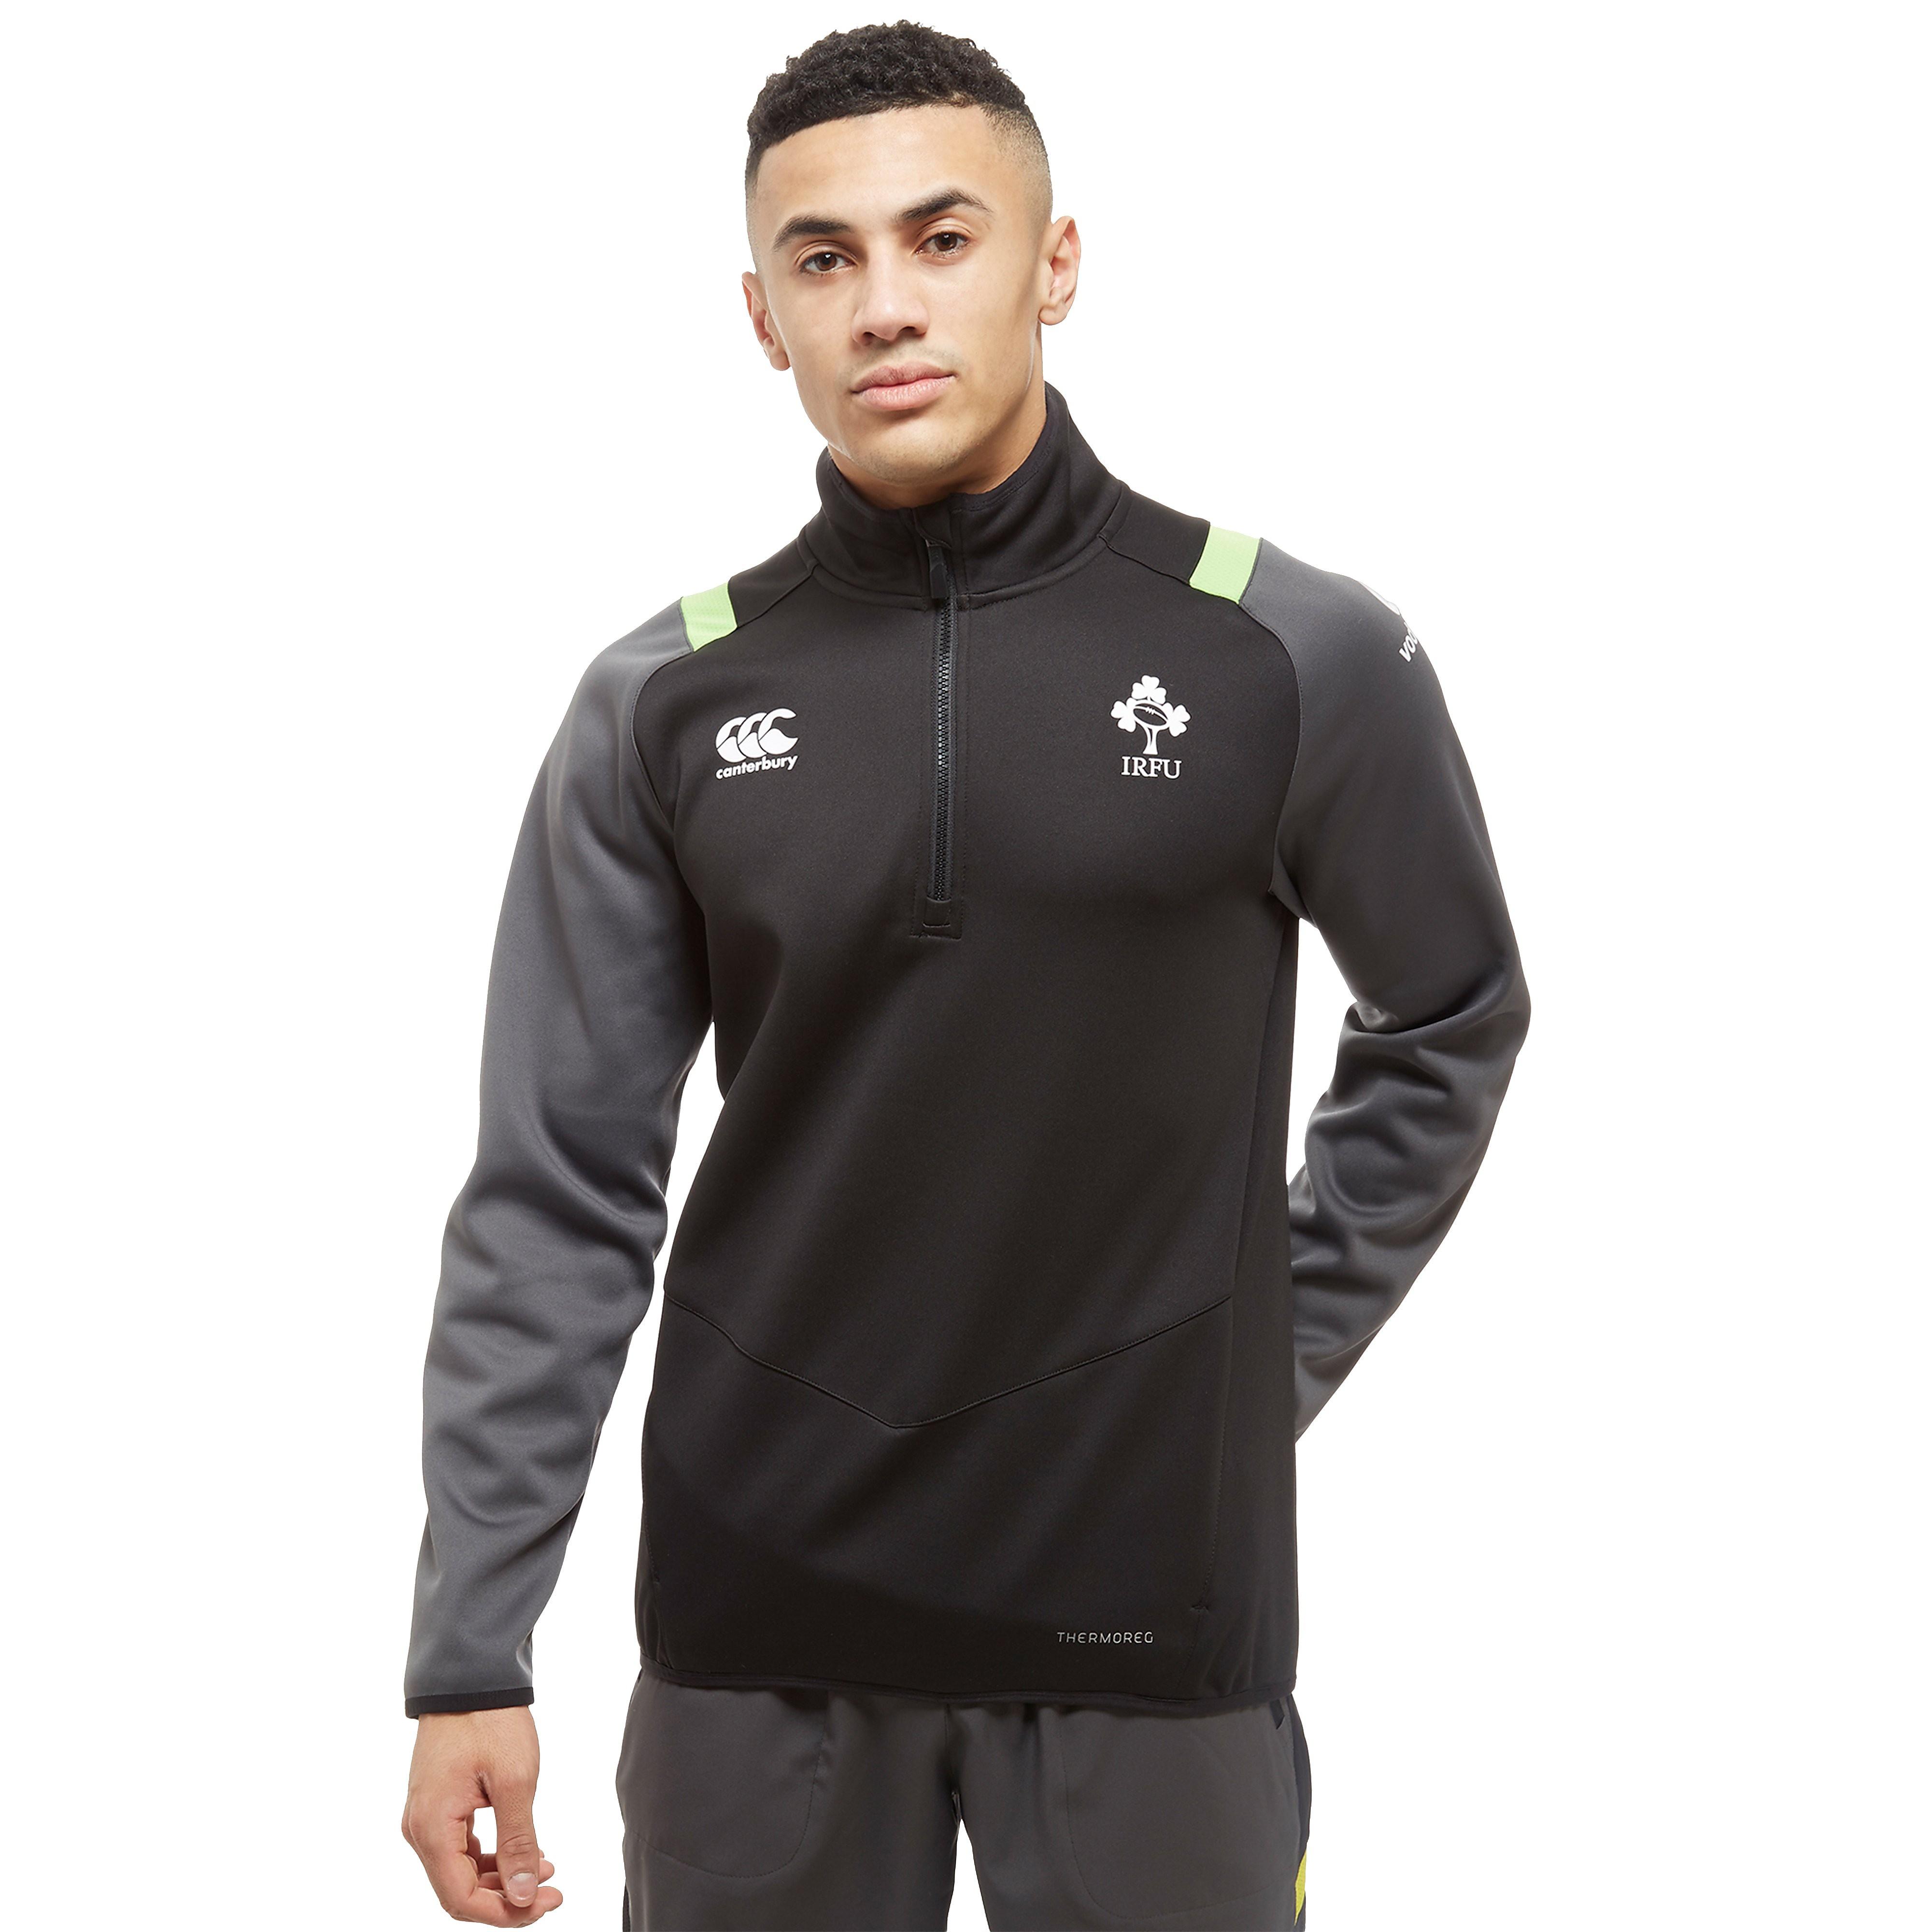 Canterbury Ireland RFU 1/2 Zip Men's Sweatshirt